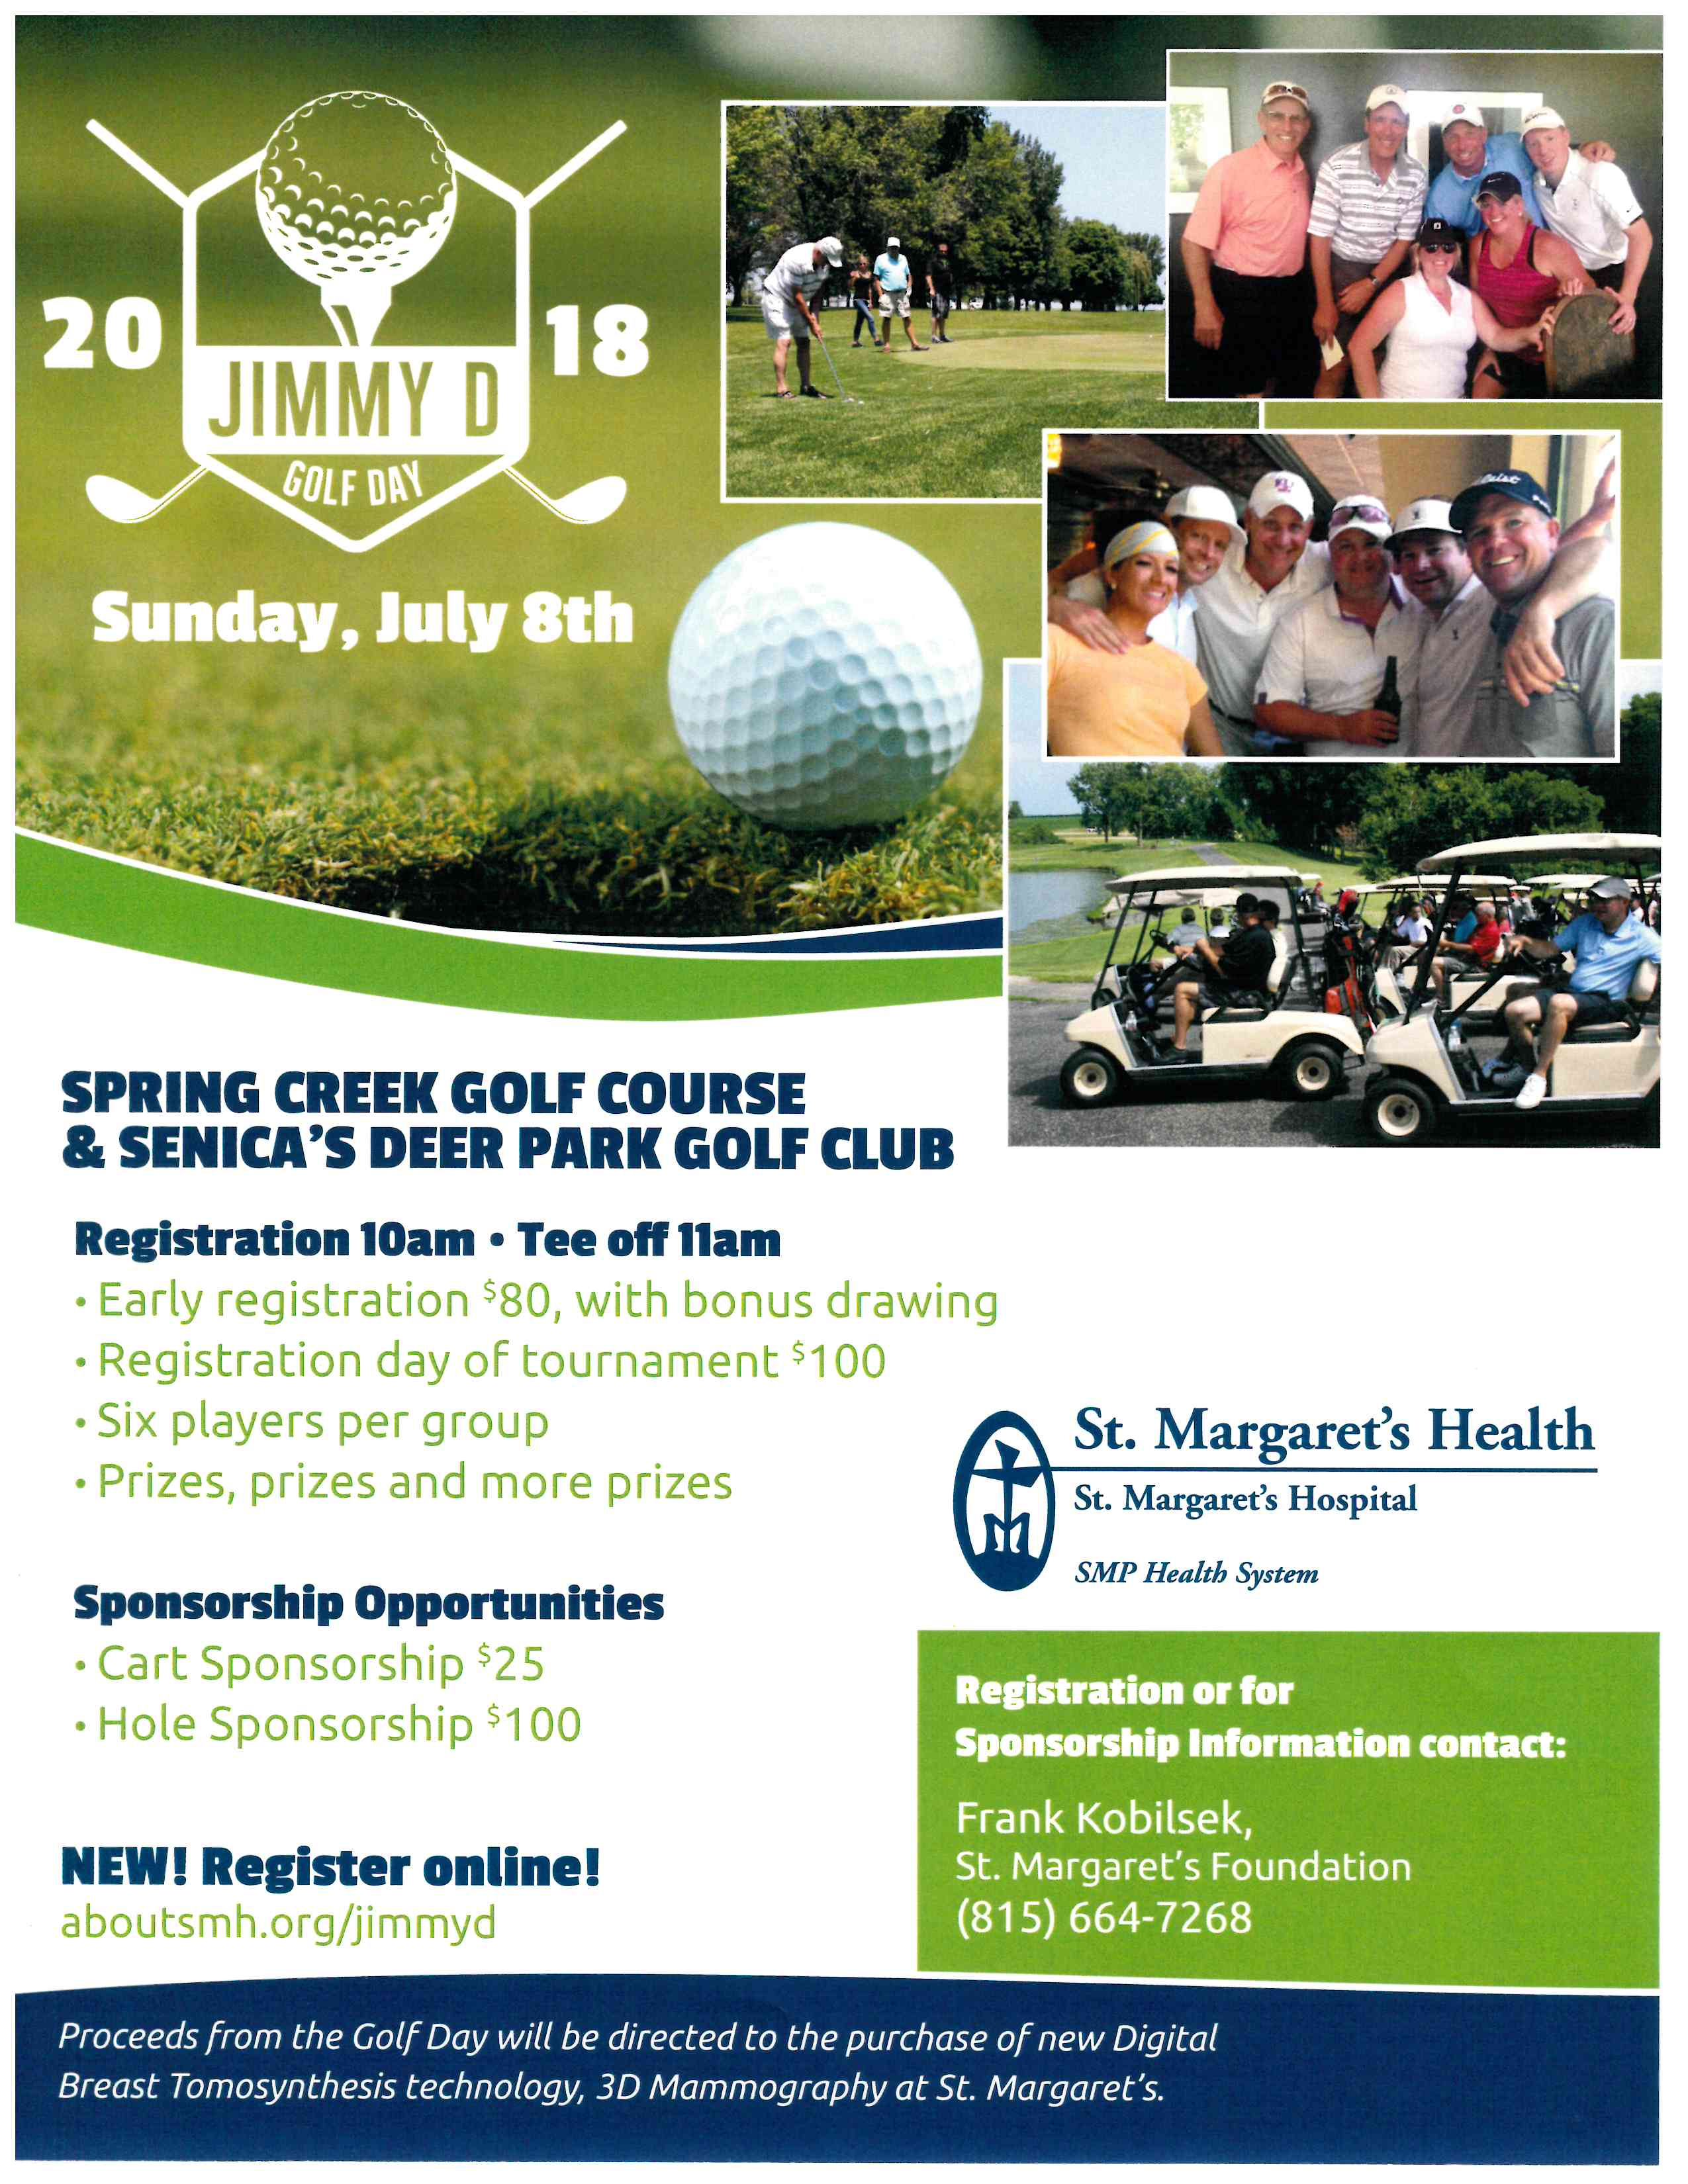 Jimmy D Golf Day Flyer